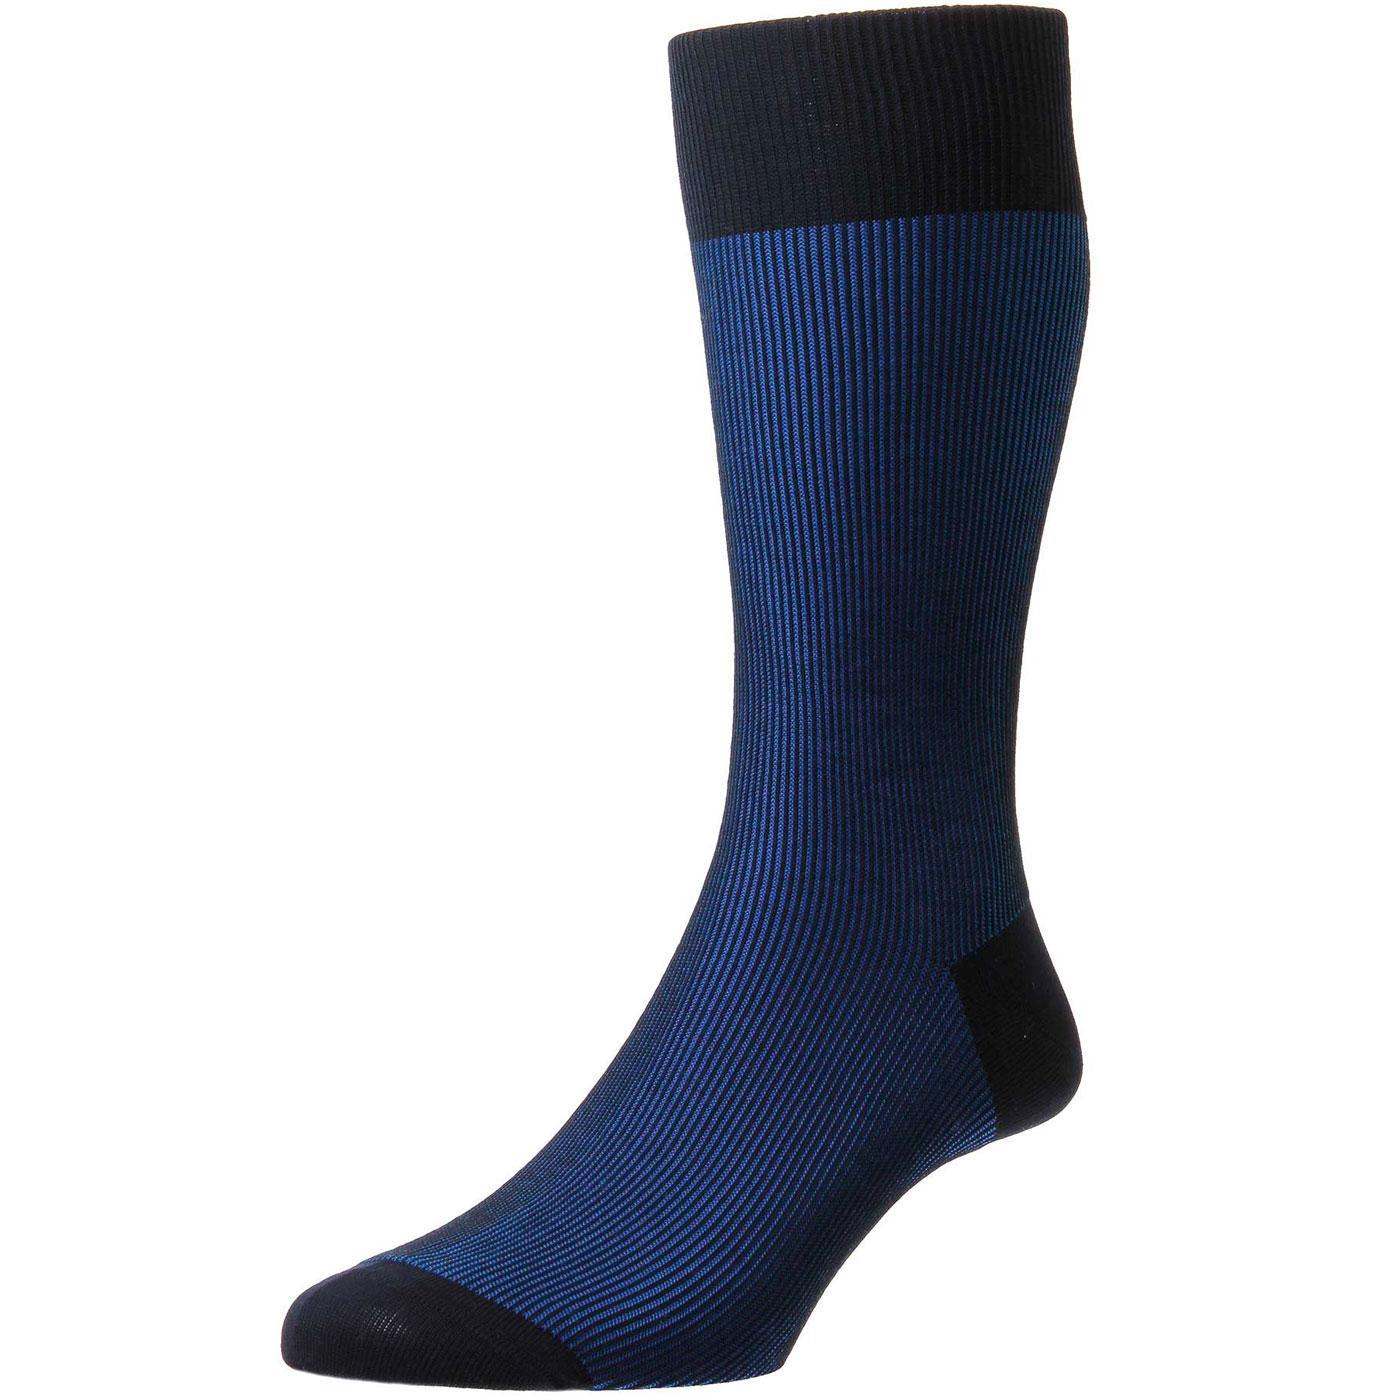 + Santos PANTHERELLA Tonic Shadow Rib Socks (Navy)